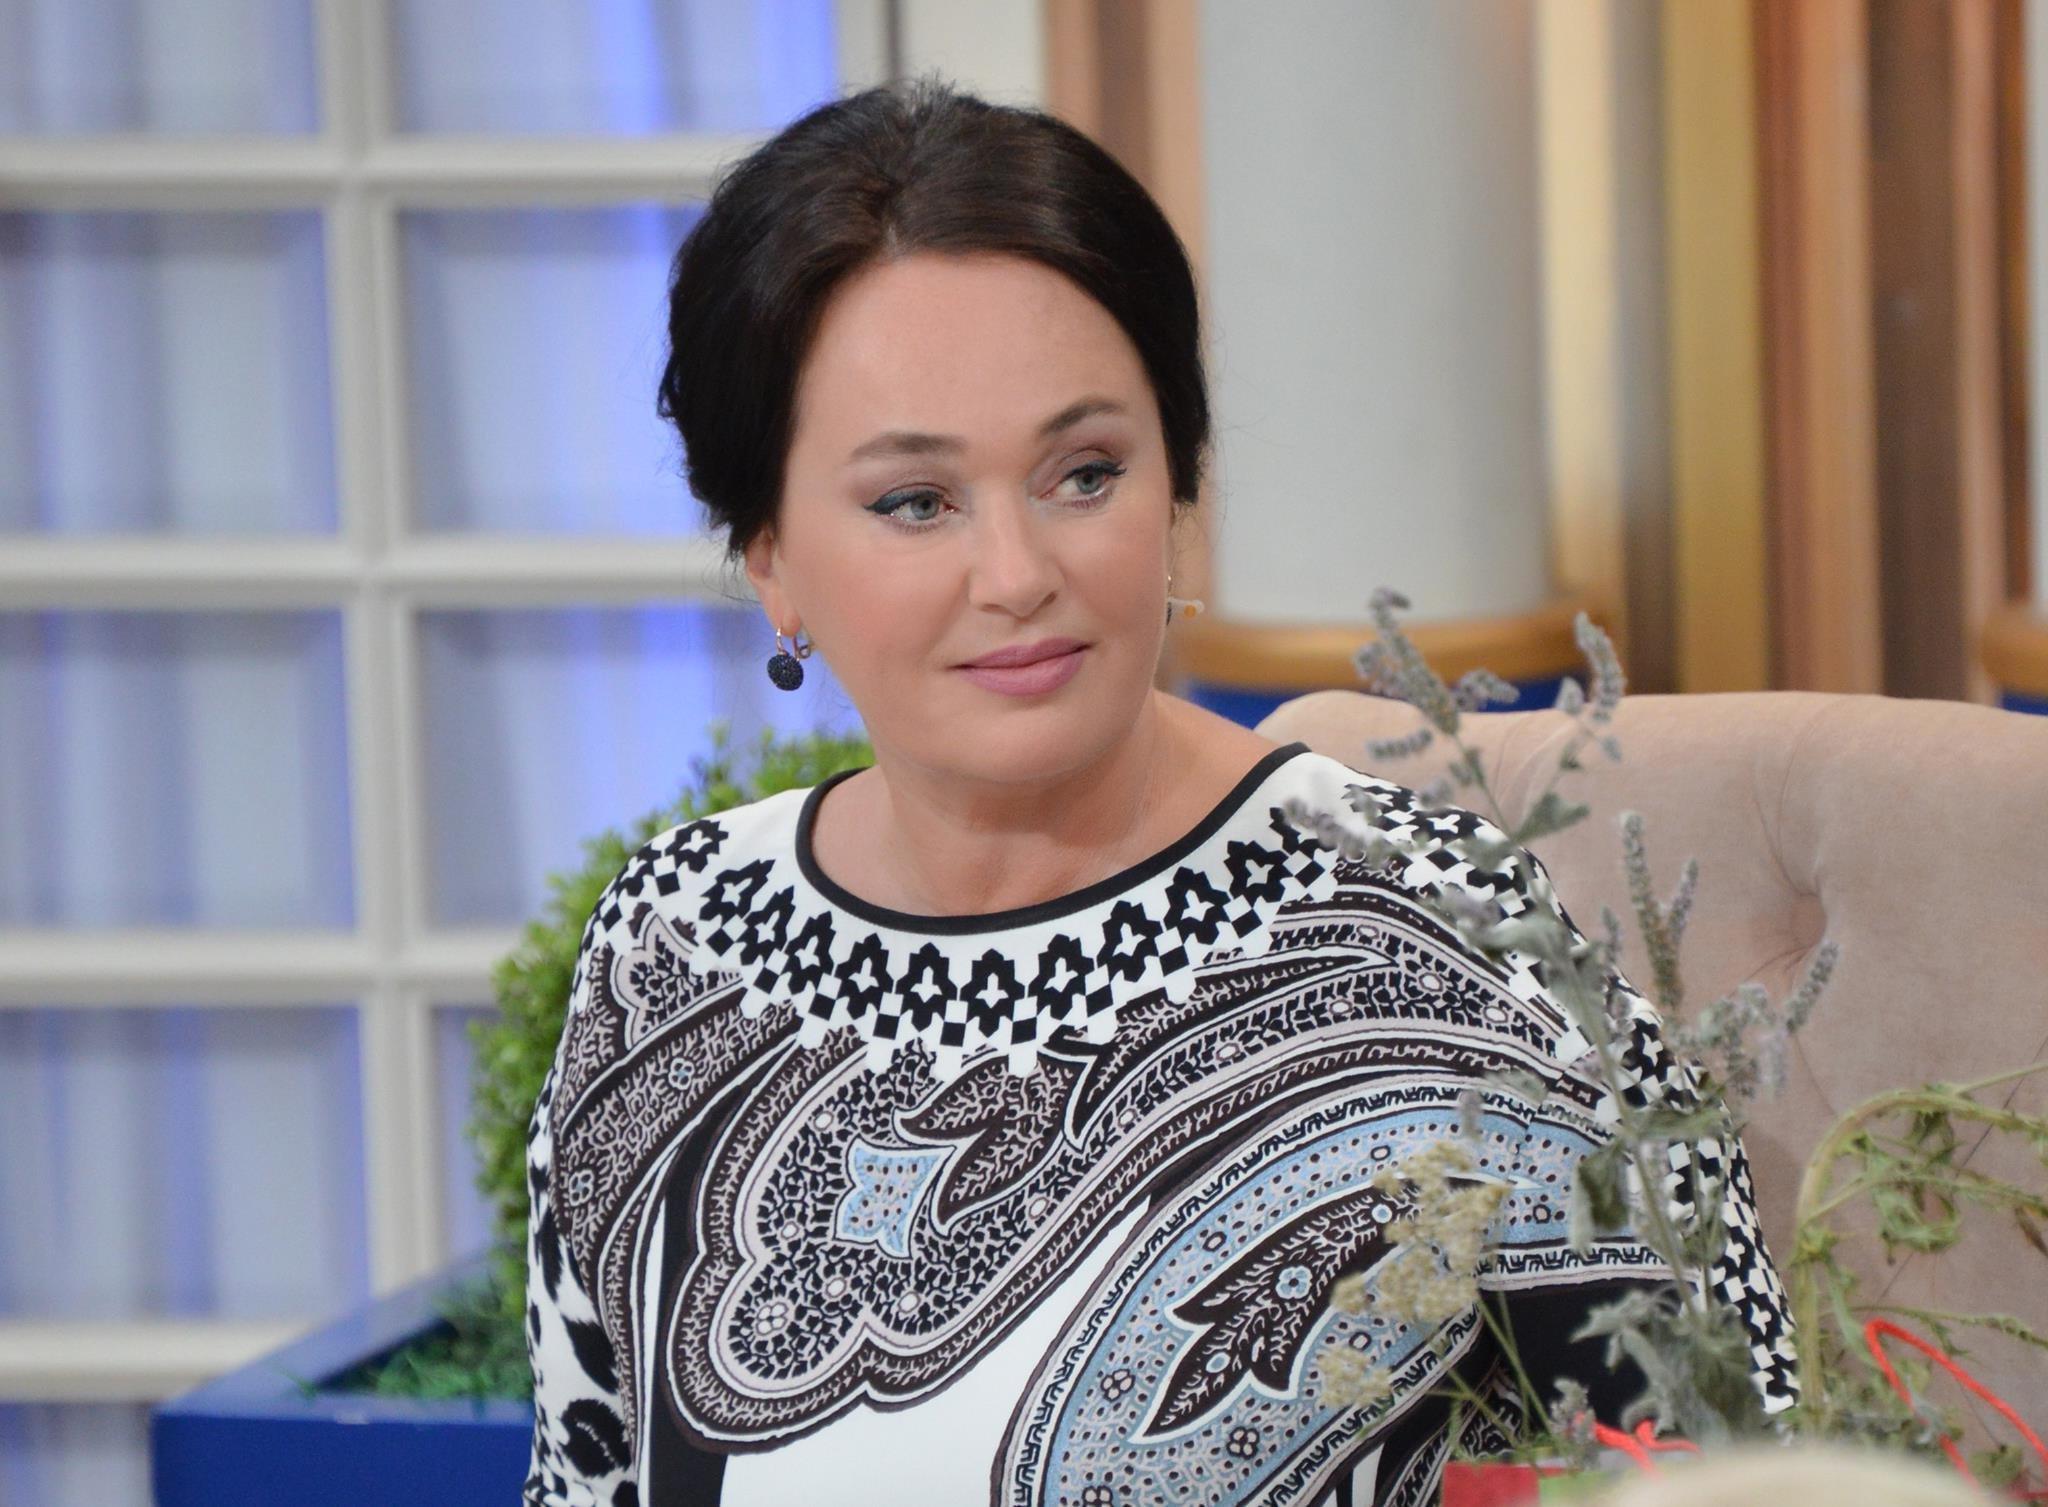 Лариса Гузеева отдыхает с мужем в Европе после слухов о разводе